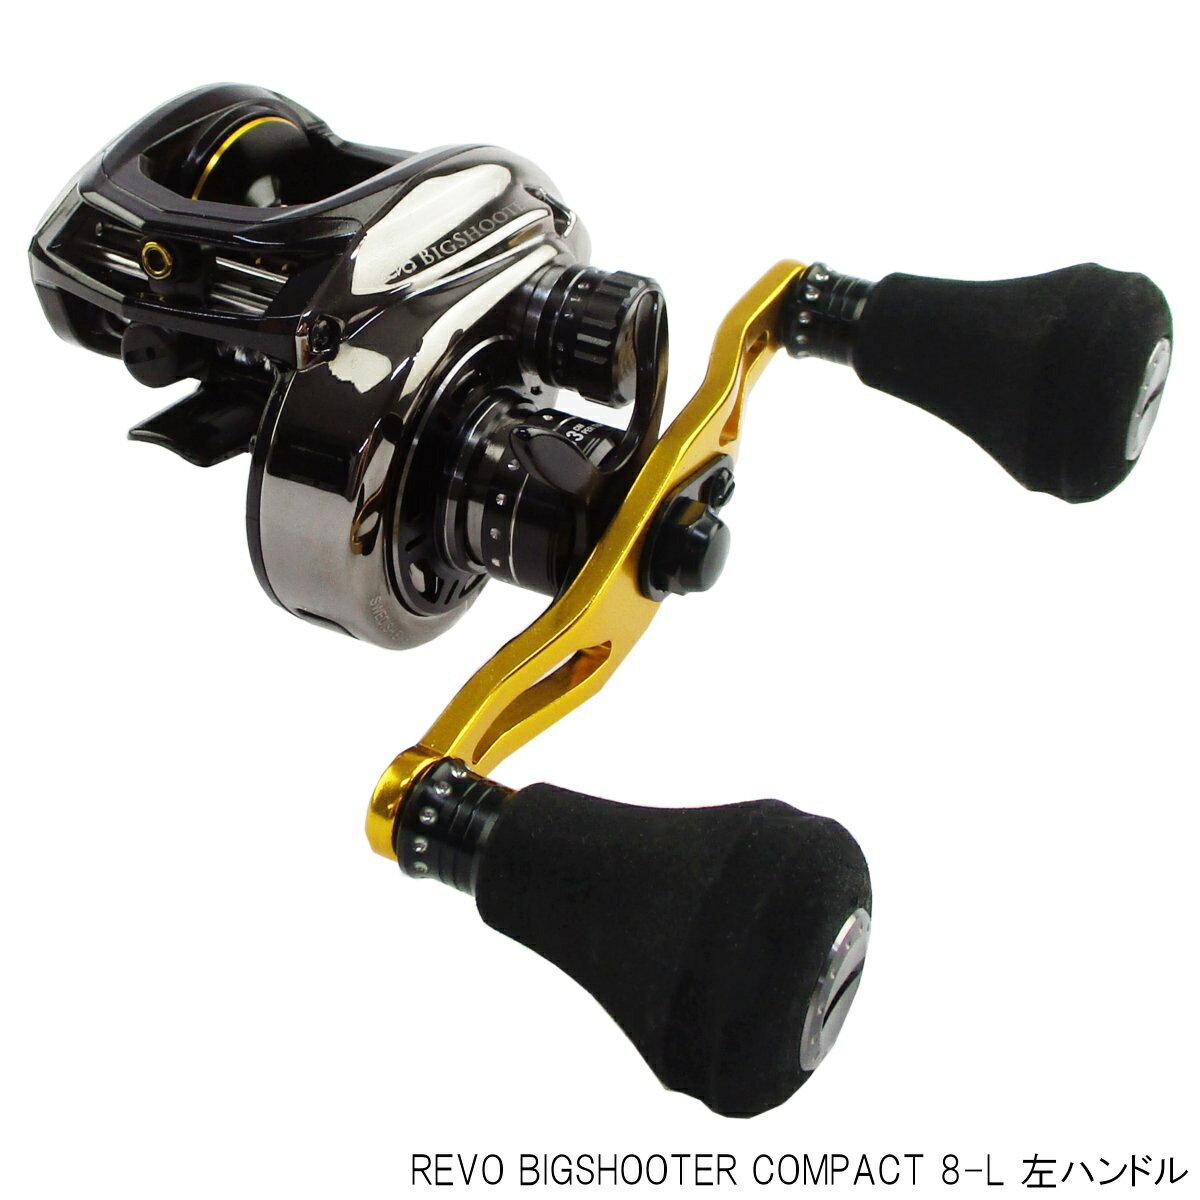 REVO BIGSHOOTER COMPACT 8-L 左ハンドル【送料無料】